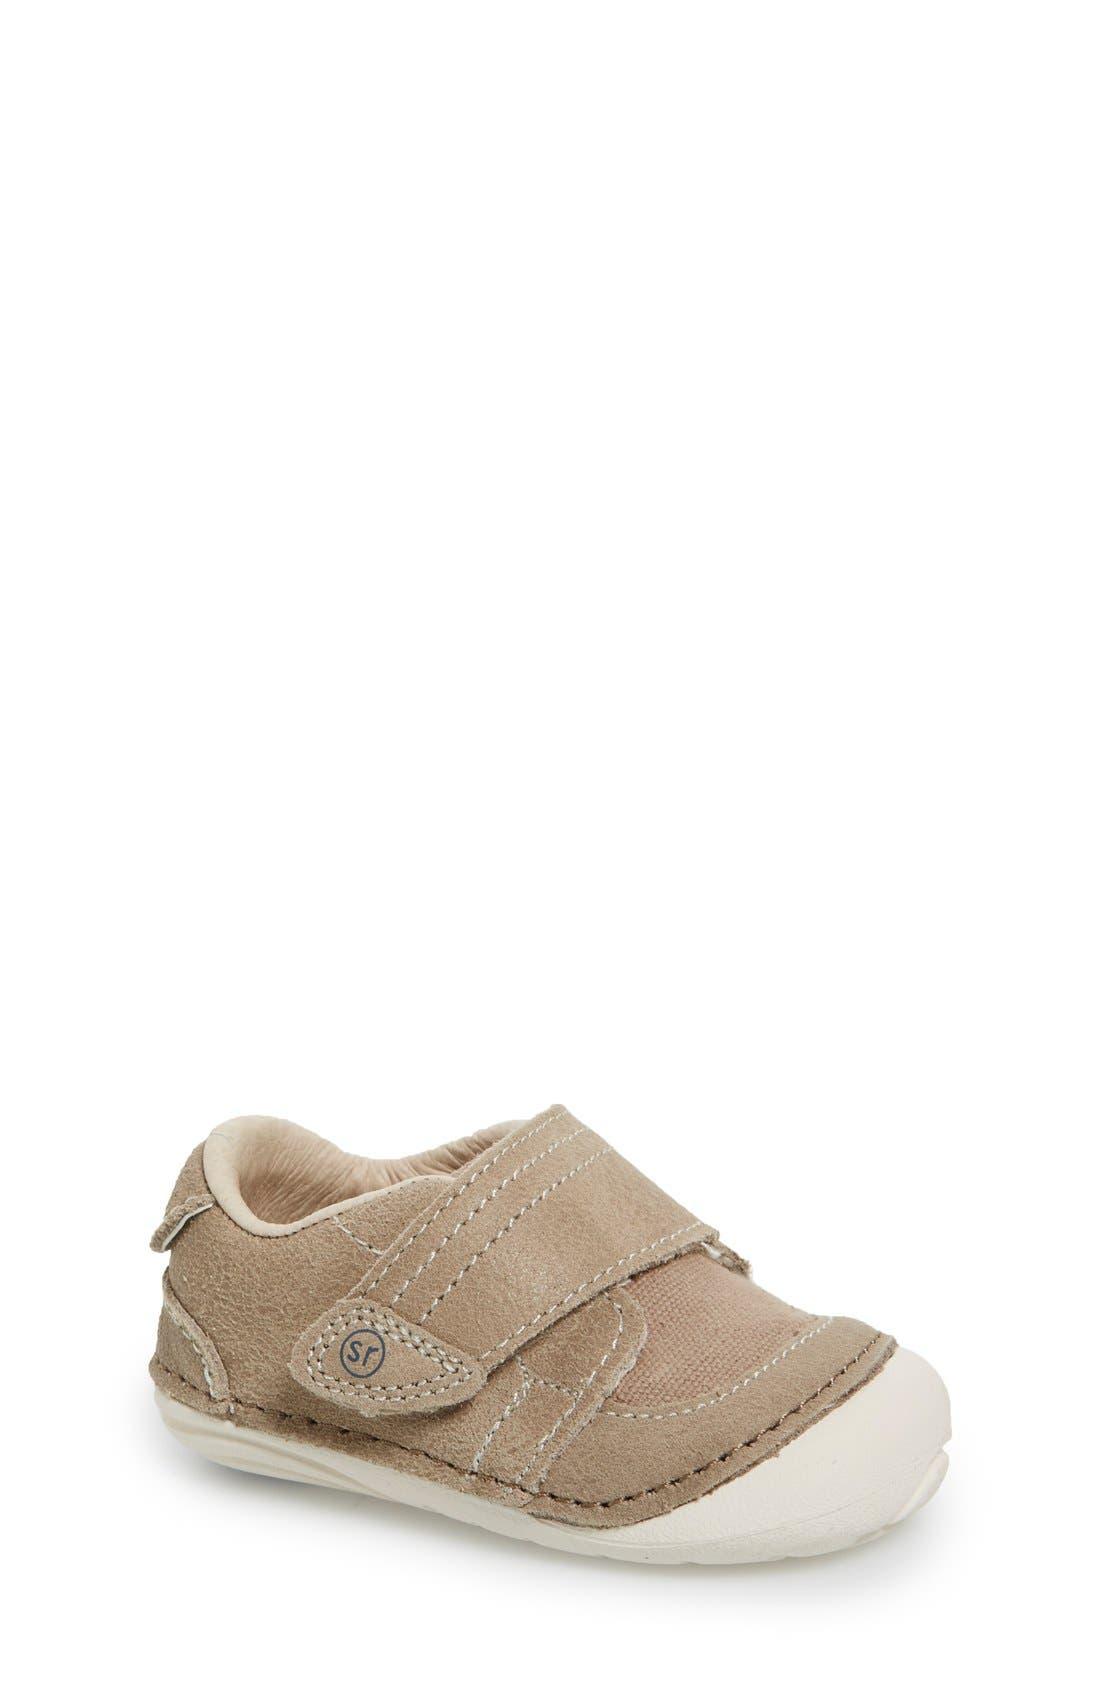 Soft Motion Kellen Sneaker,                         Main,                         color, Tan